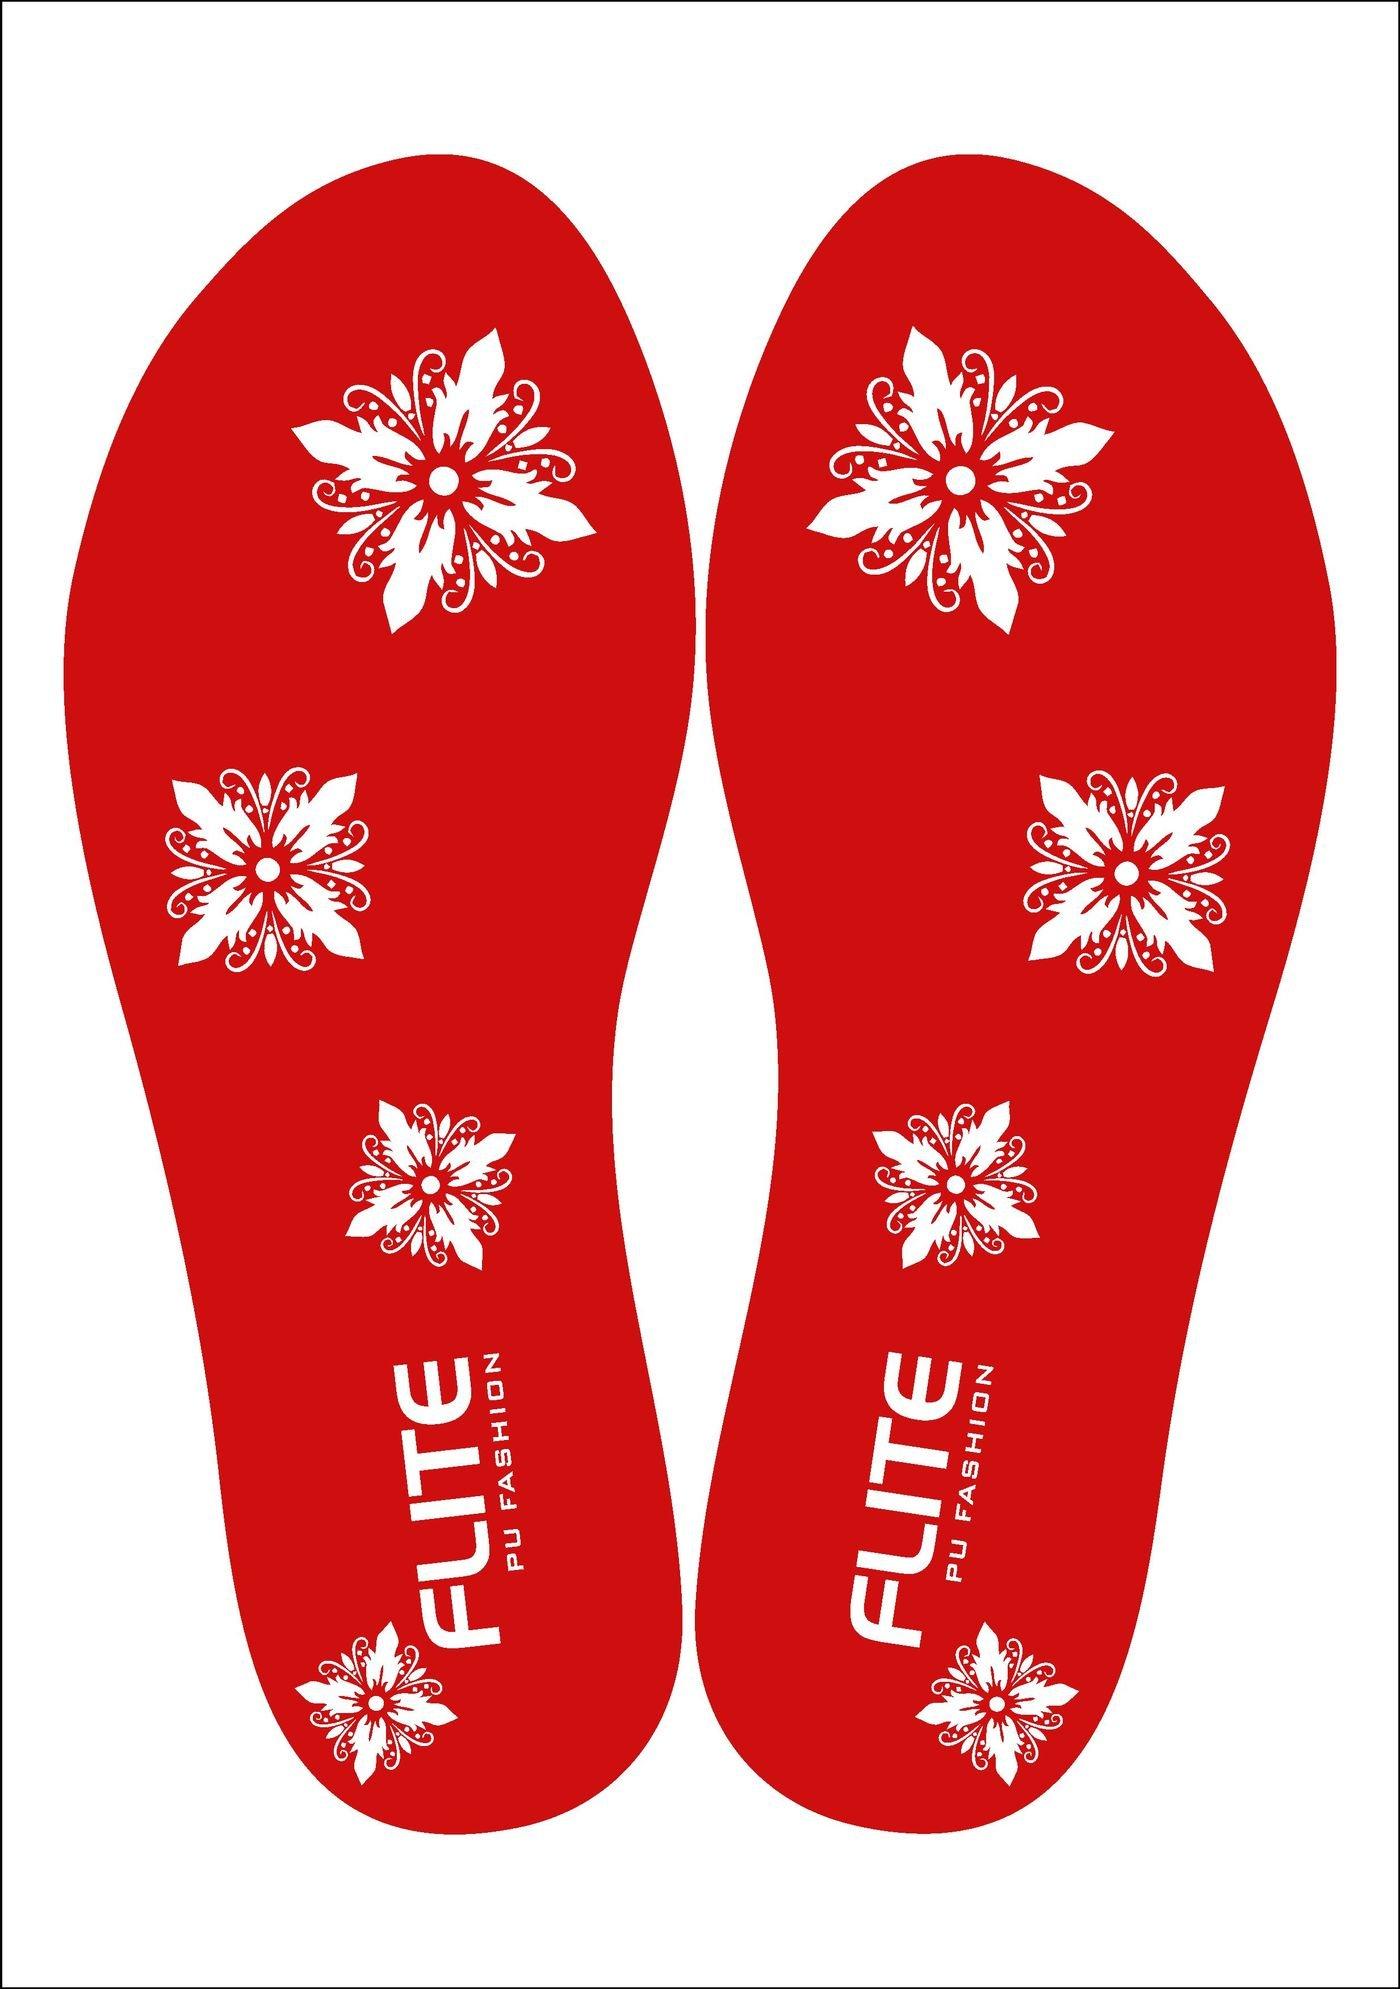 Flite PU slippers - insole artwork